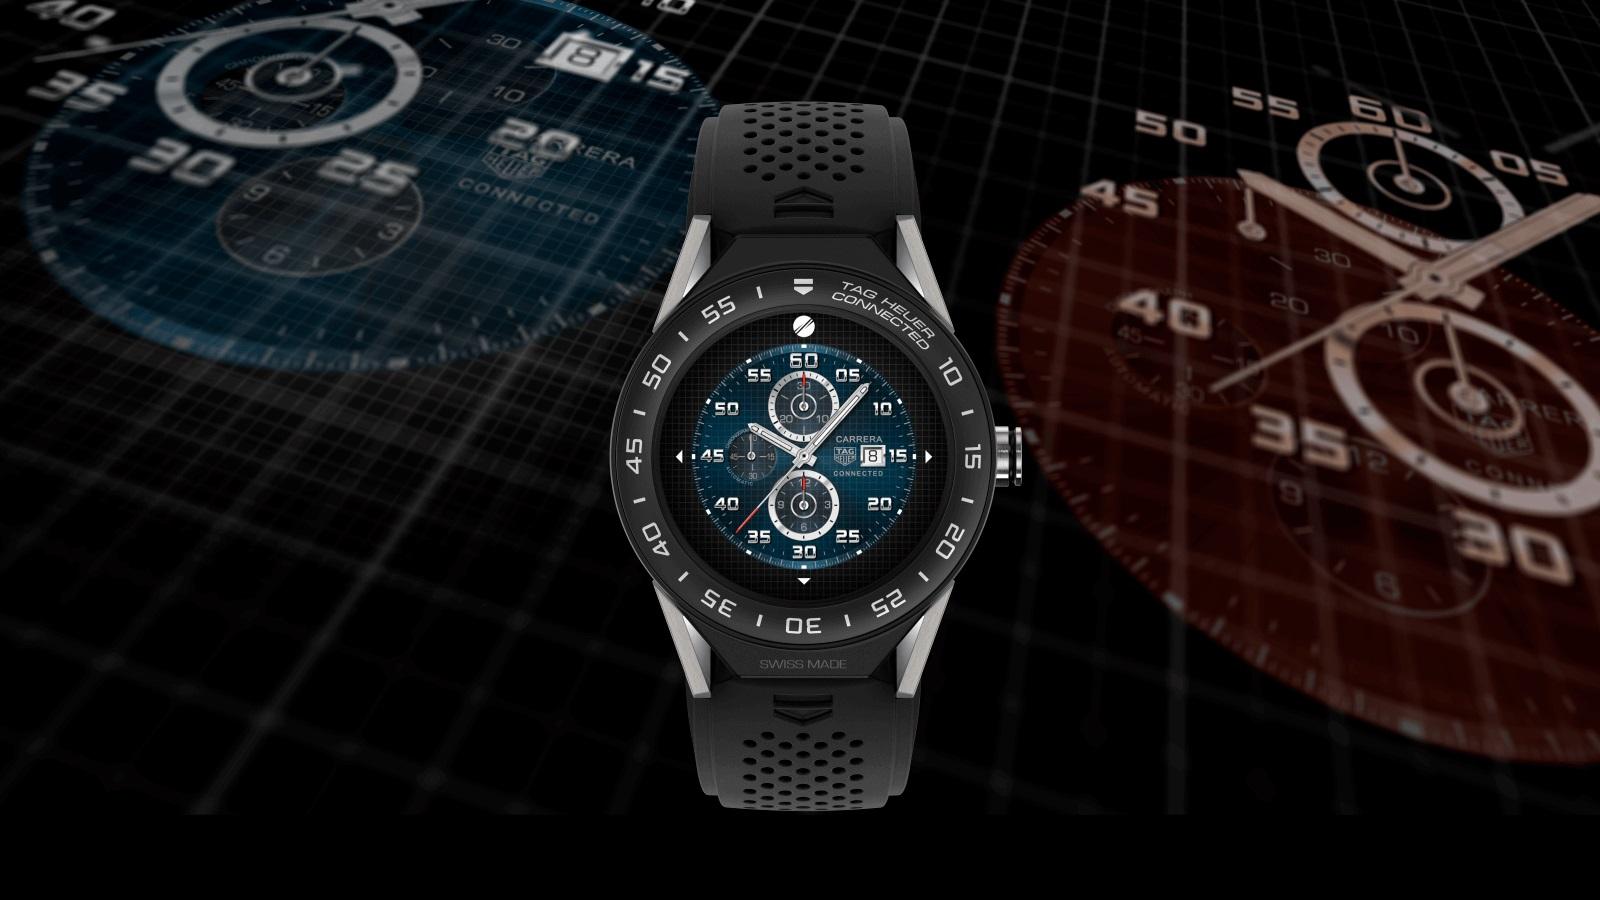 525a83faeef Tag Heuer anuncia smartwatch modular de luxo com Android Wear e ...